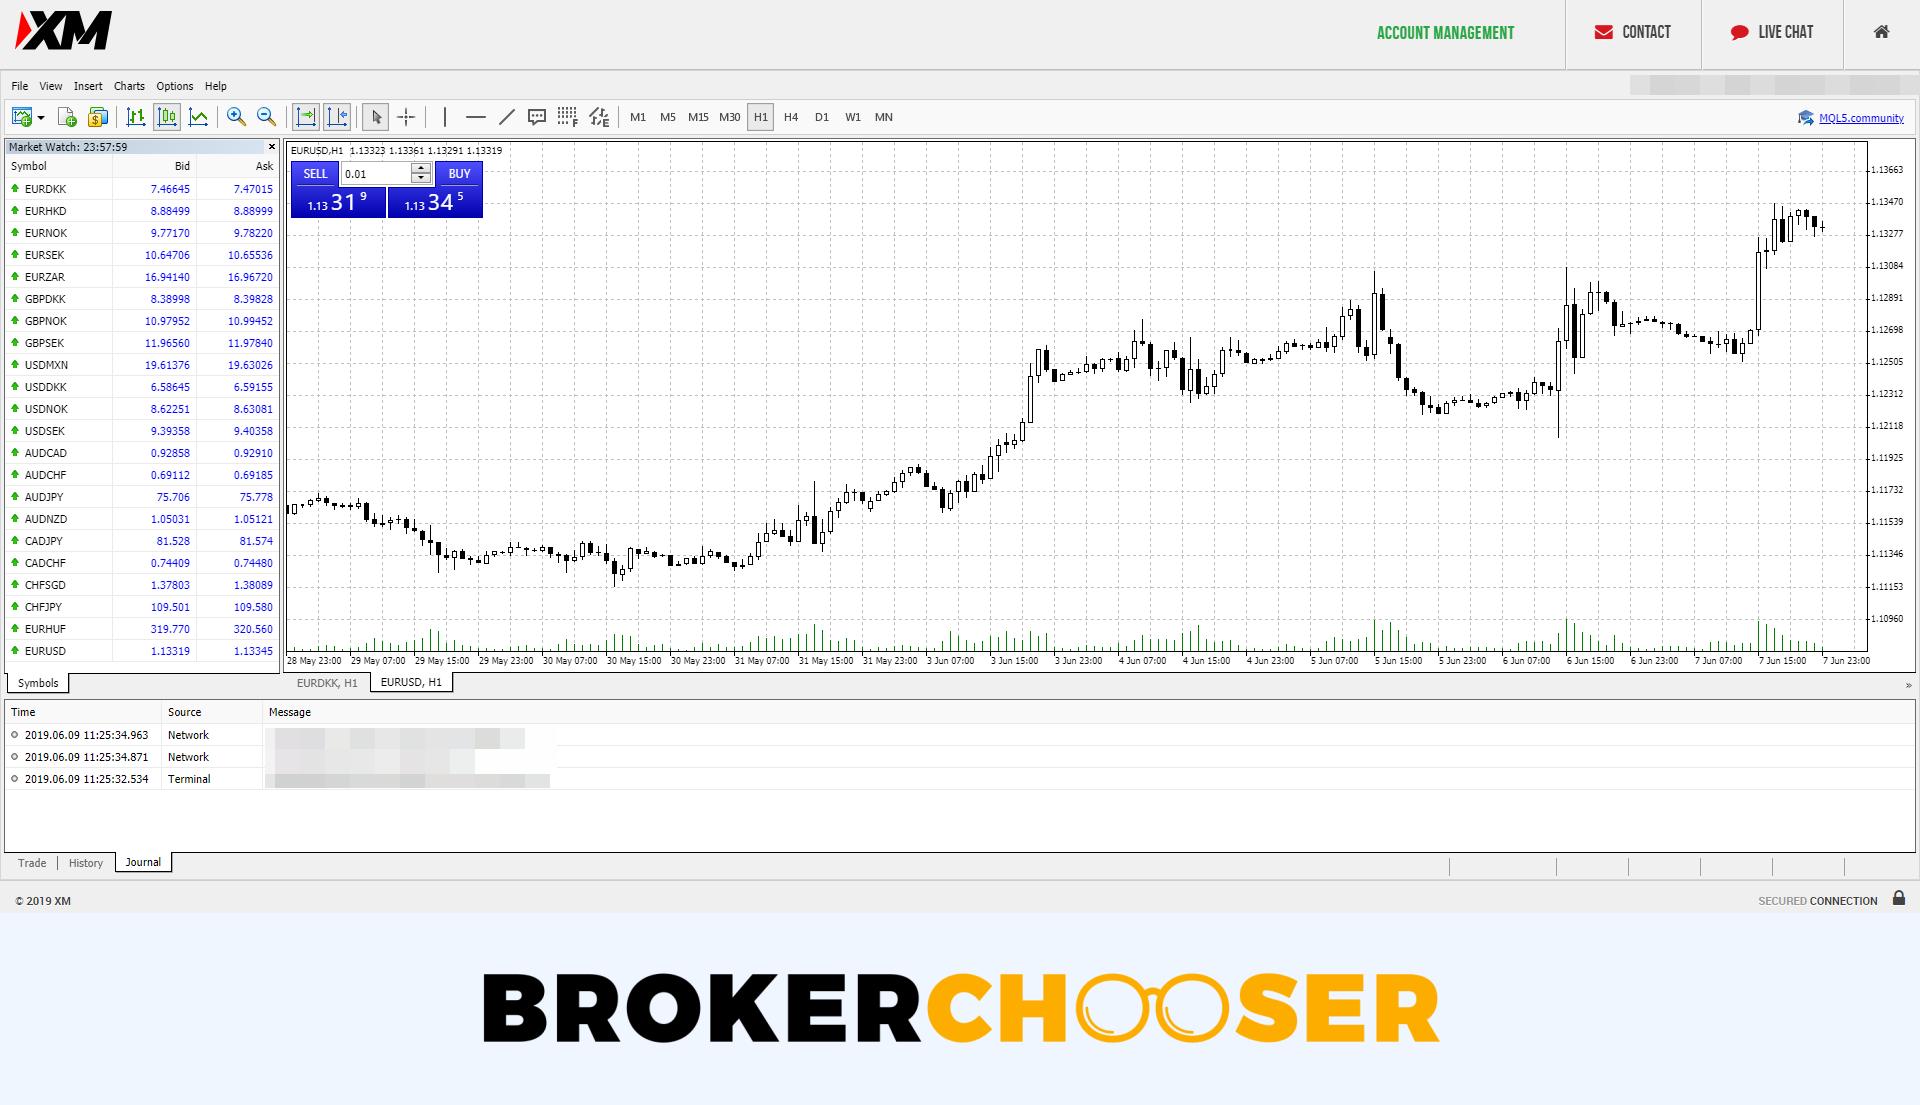 XM - Web trading platform